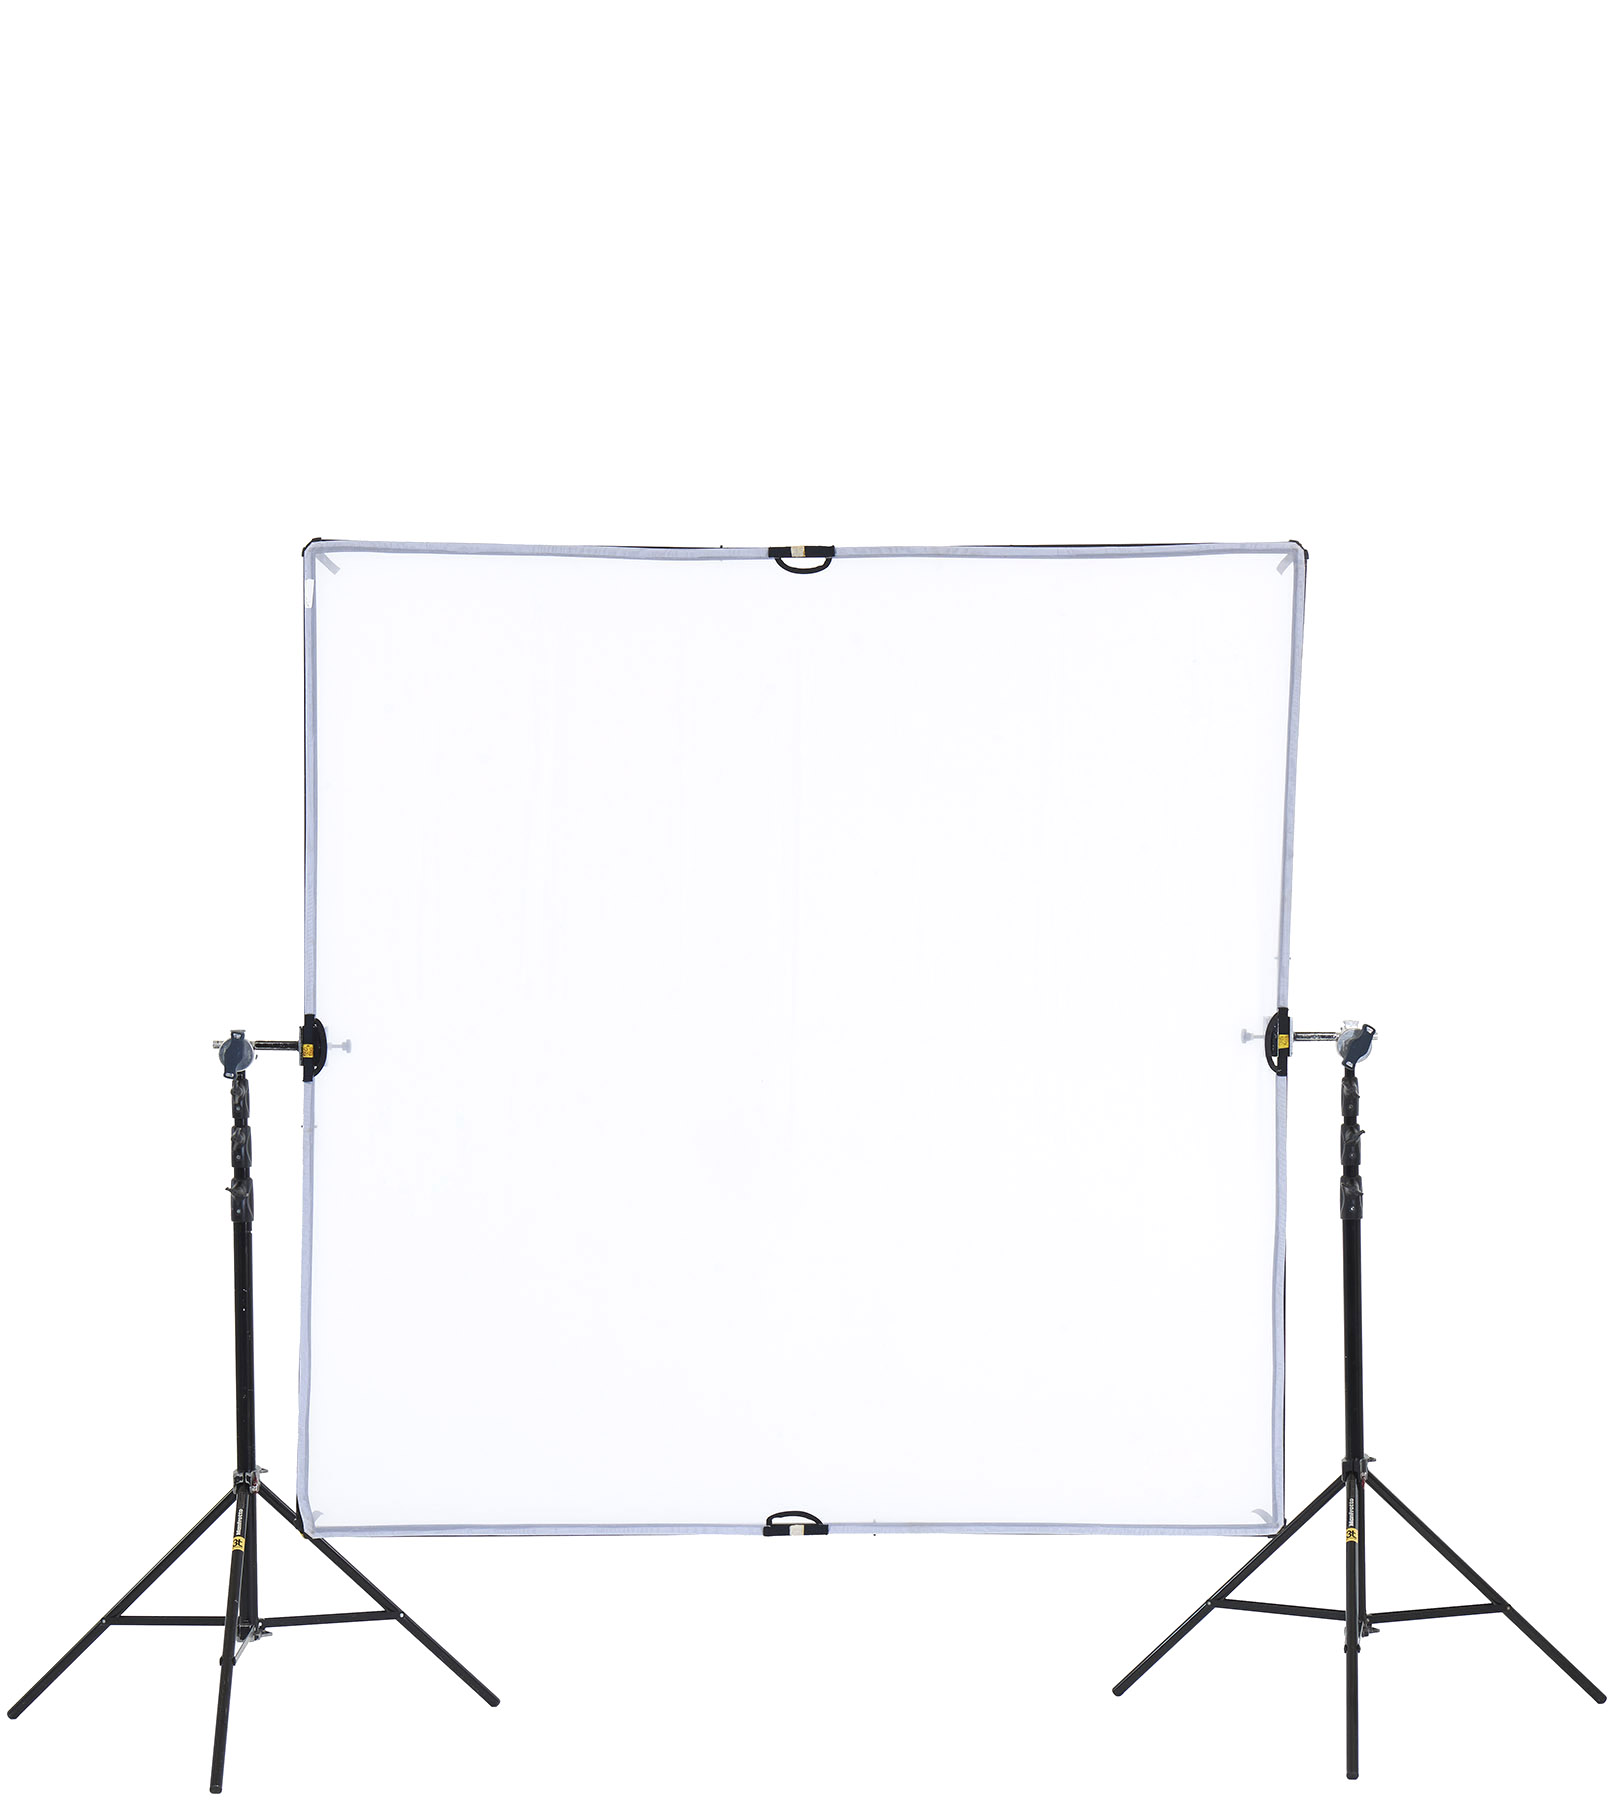 Scrim Jim Kit (180x180cm) com tripés Manfrotto 3 estágios 1004 baac